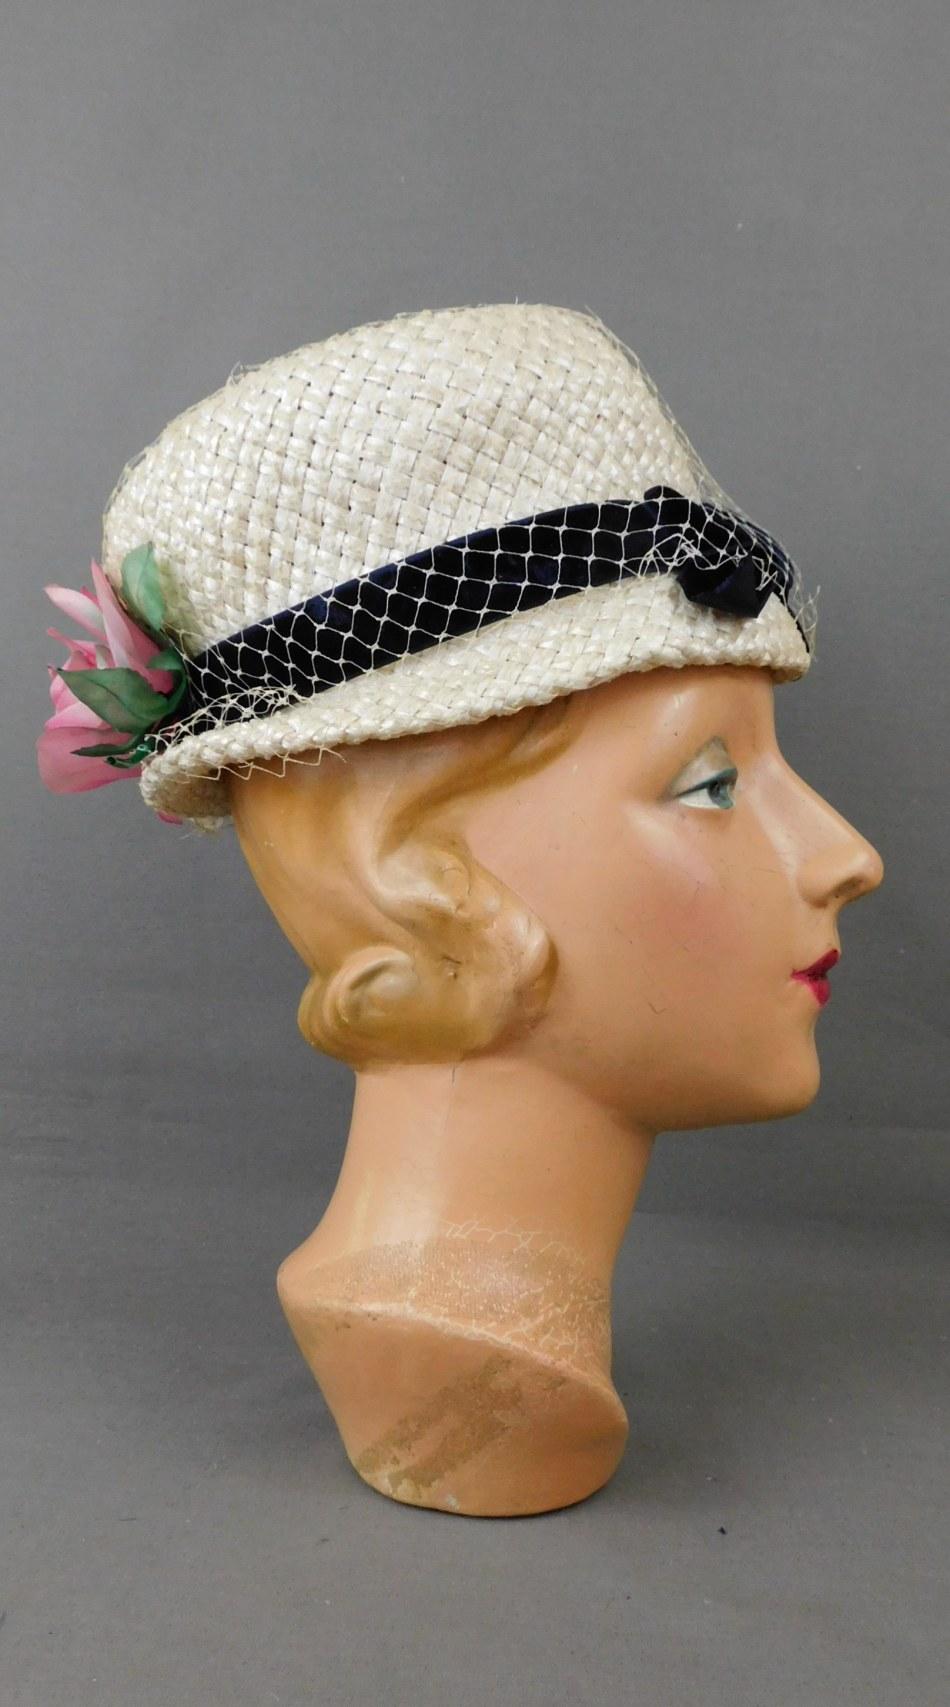 Vintage White Straw Floral Hat with Navy Velvet Ribbon, 1960s